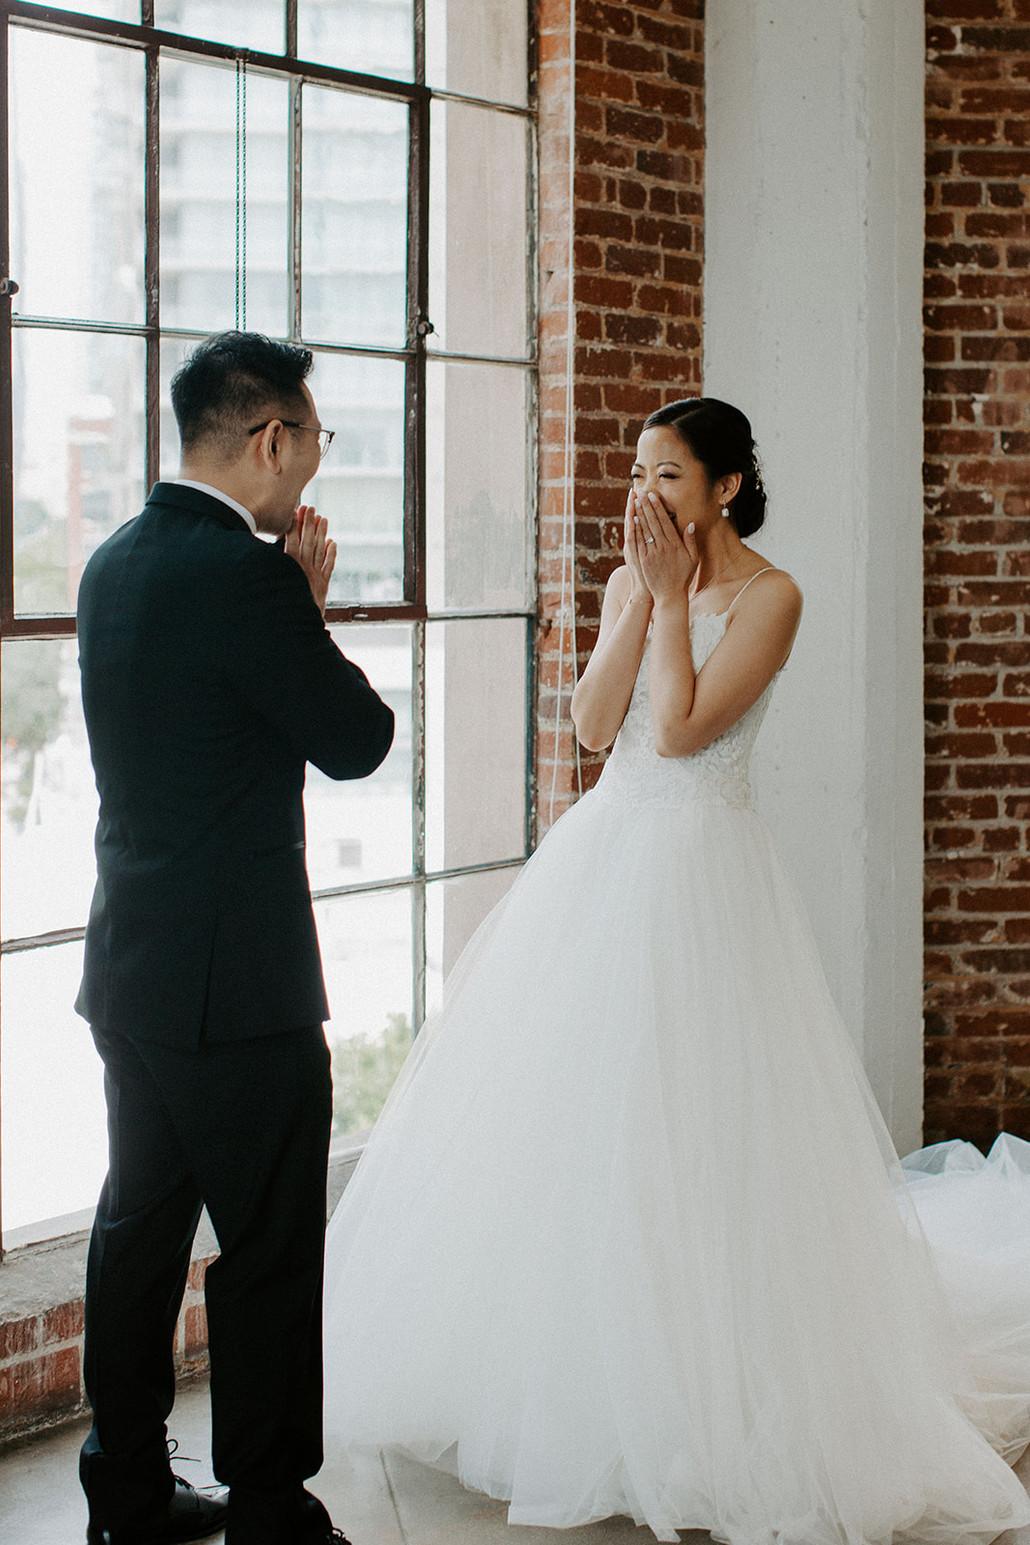 charmaine_ben_wedding_0216_websize.jpg